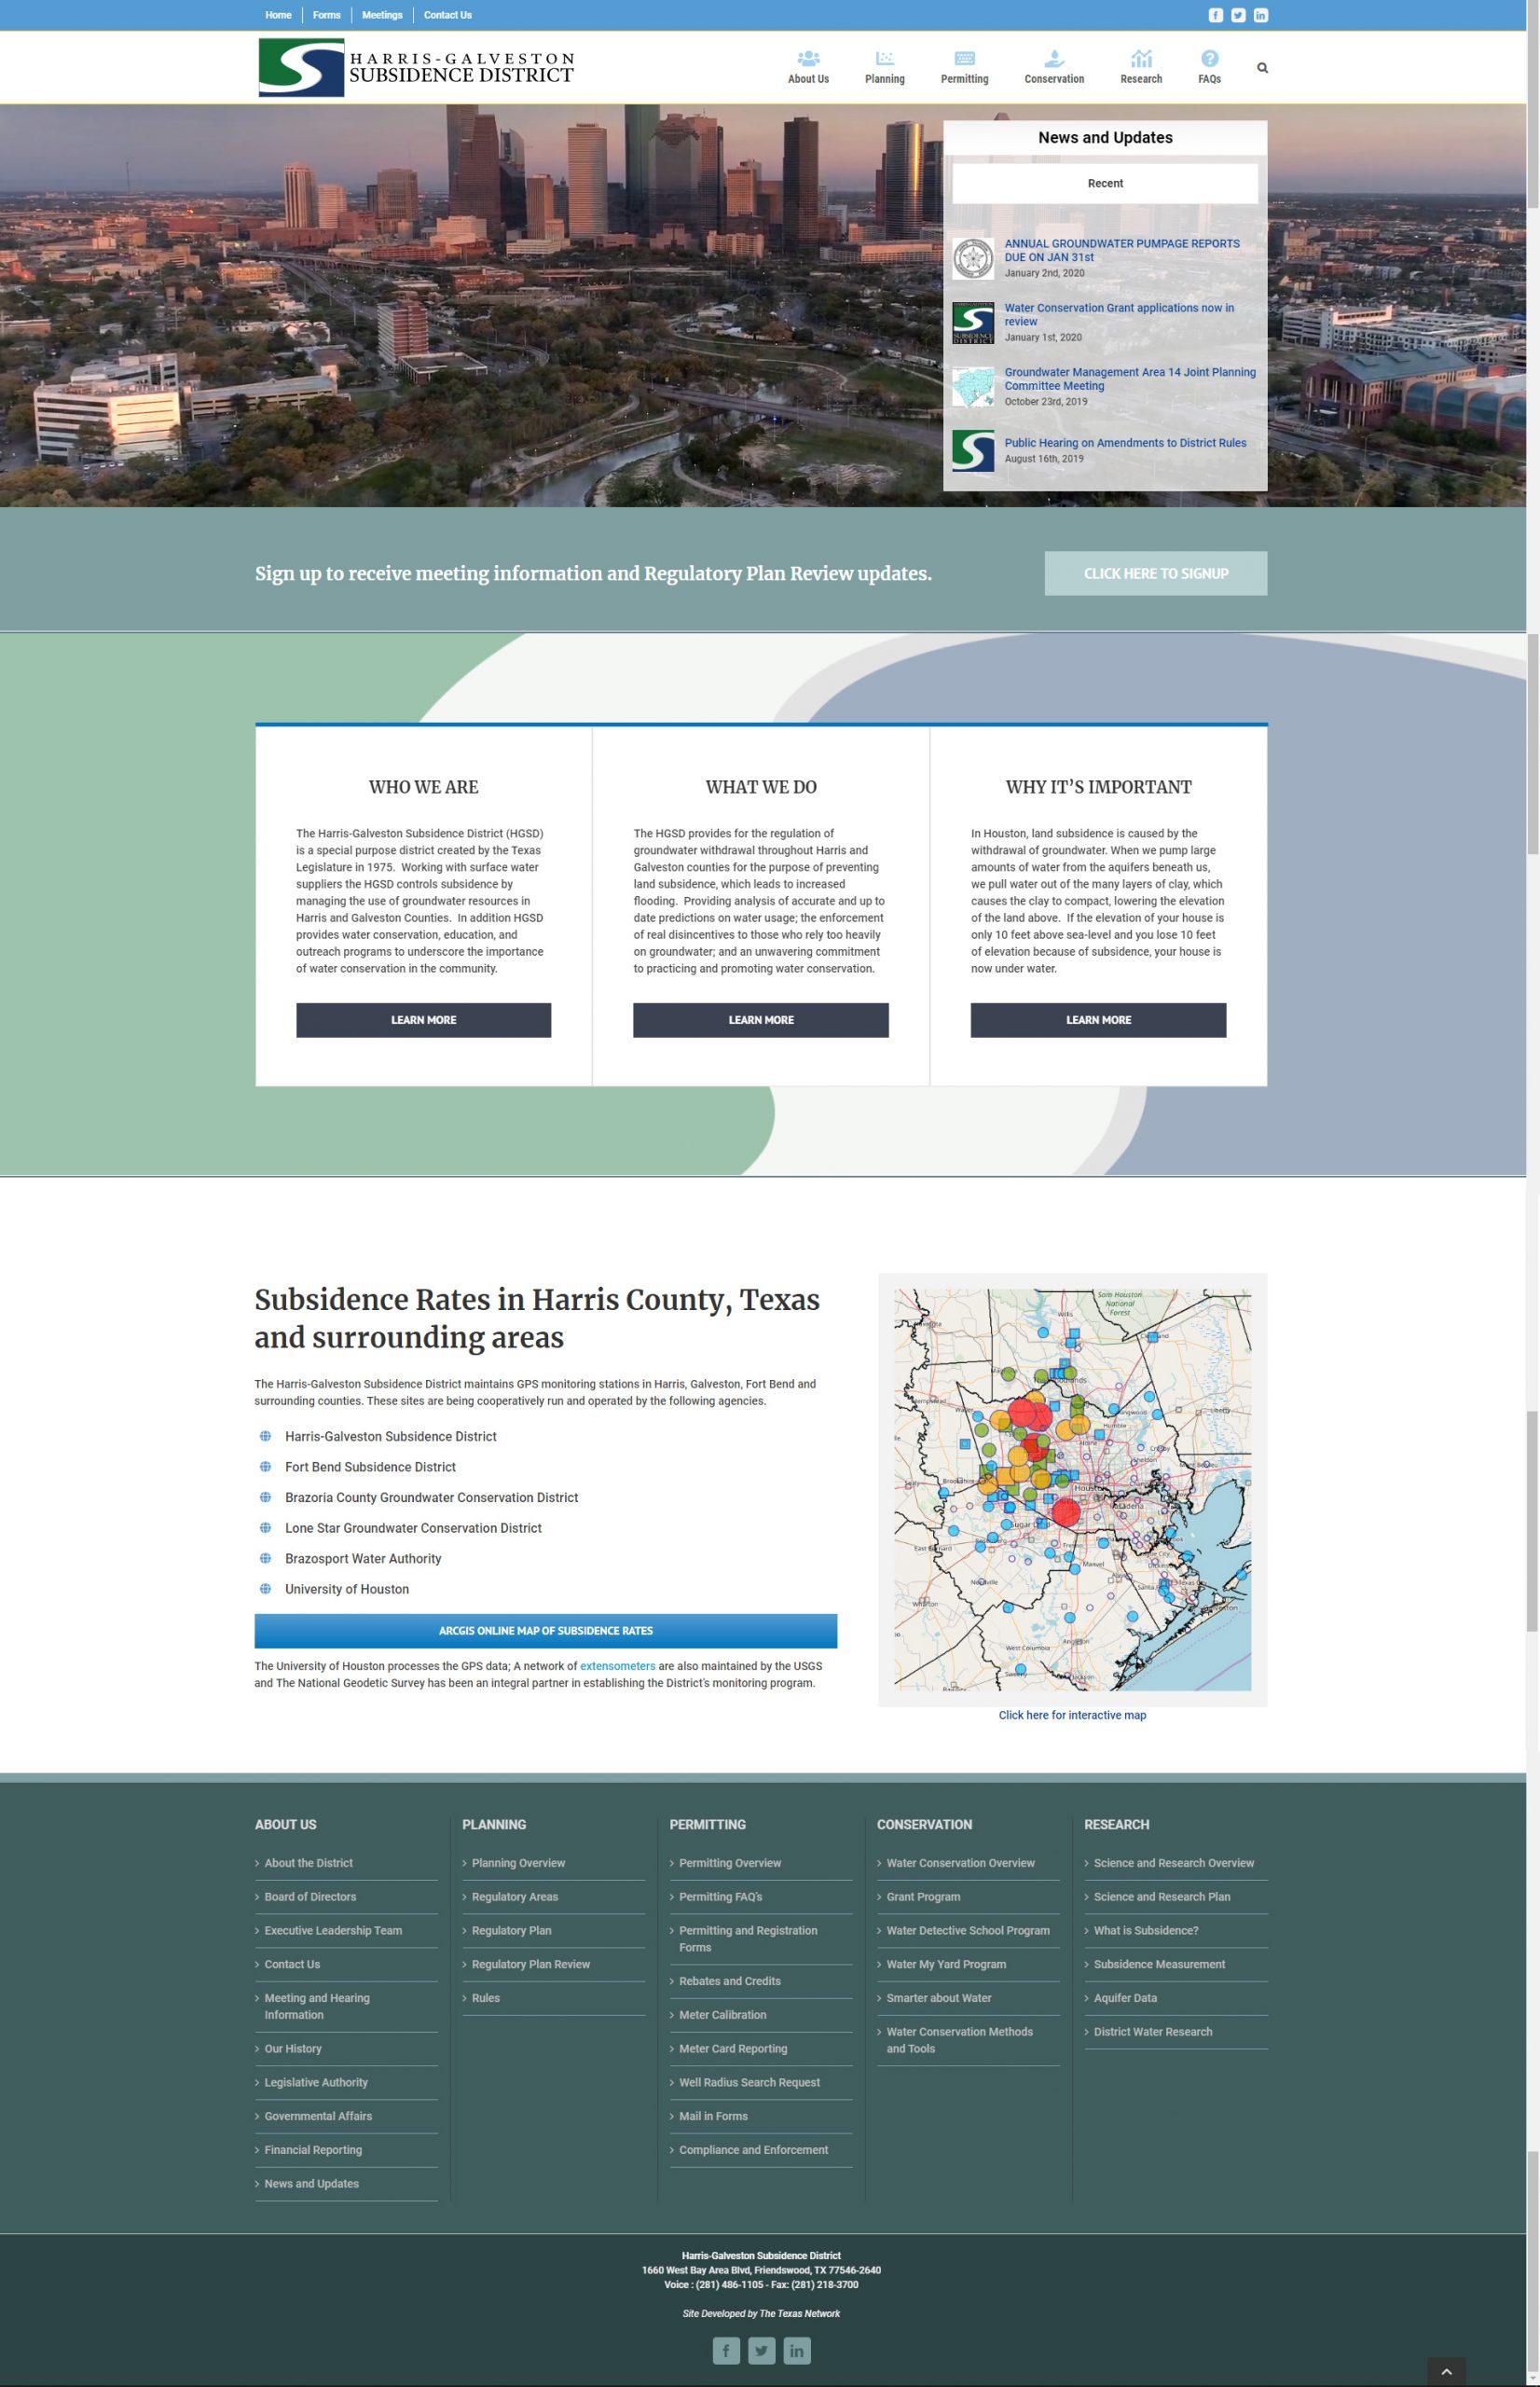 Harris-Galveston Subsidence District